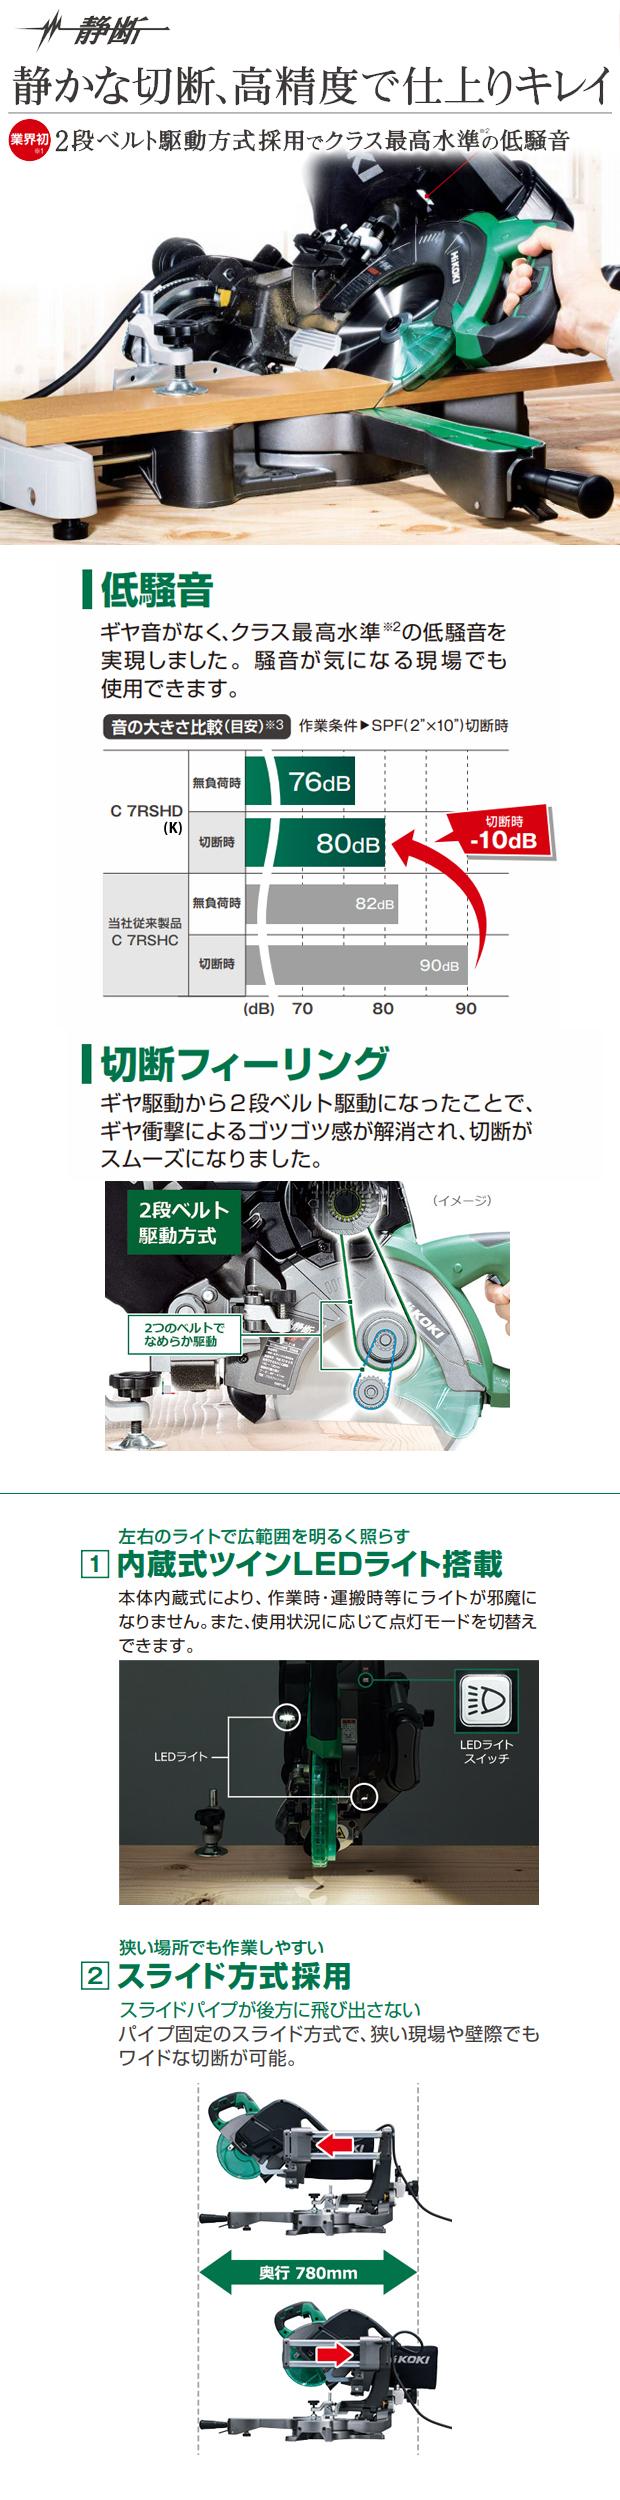 HiKOKI 190mm卓上スライドマルノコ C7RSHD